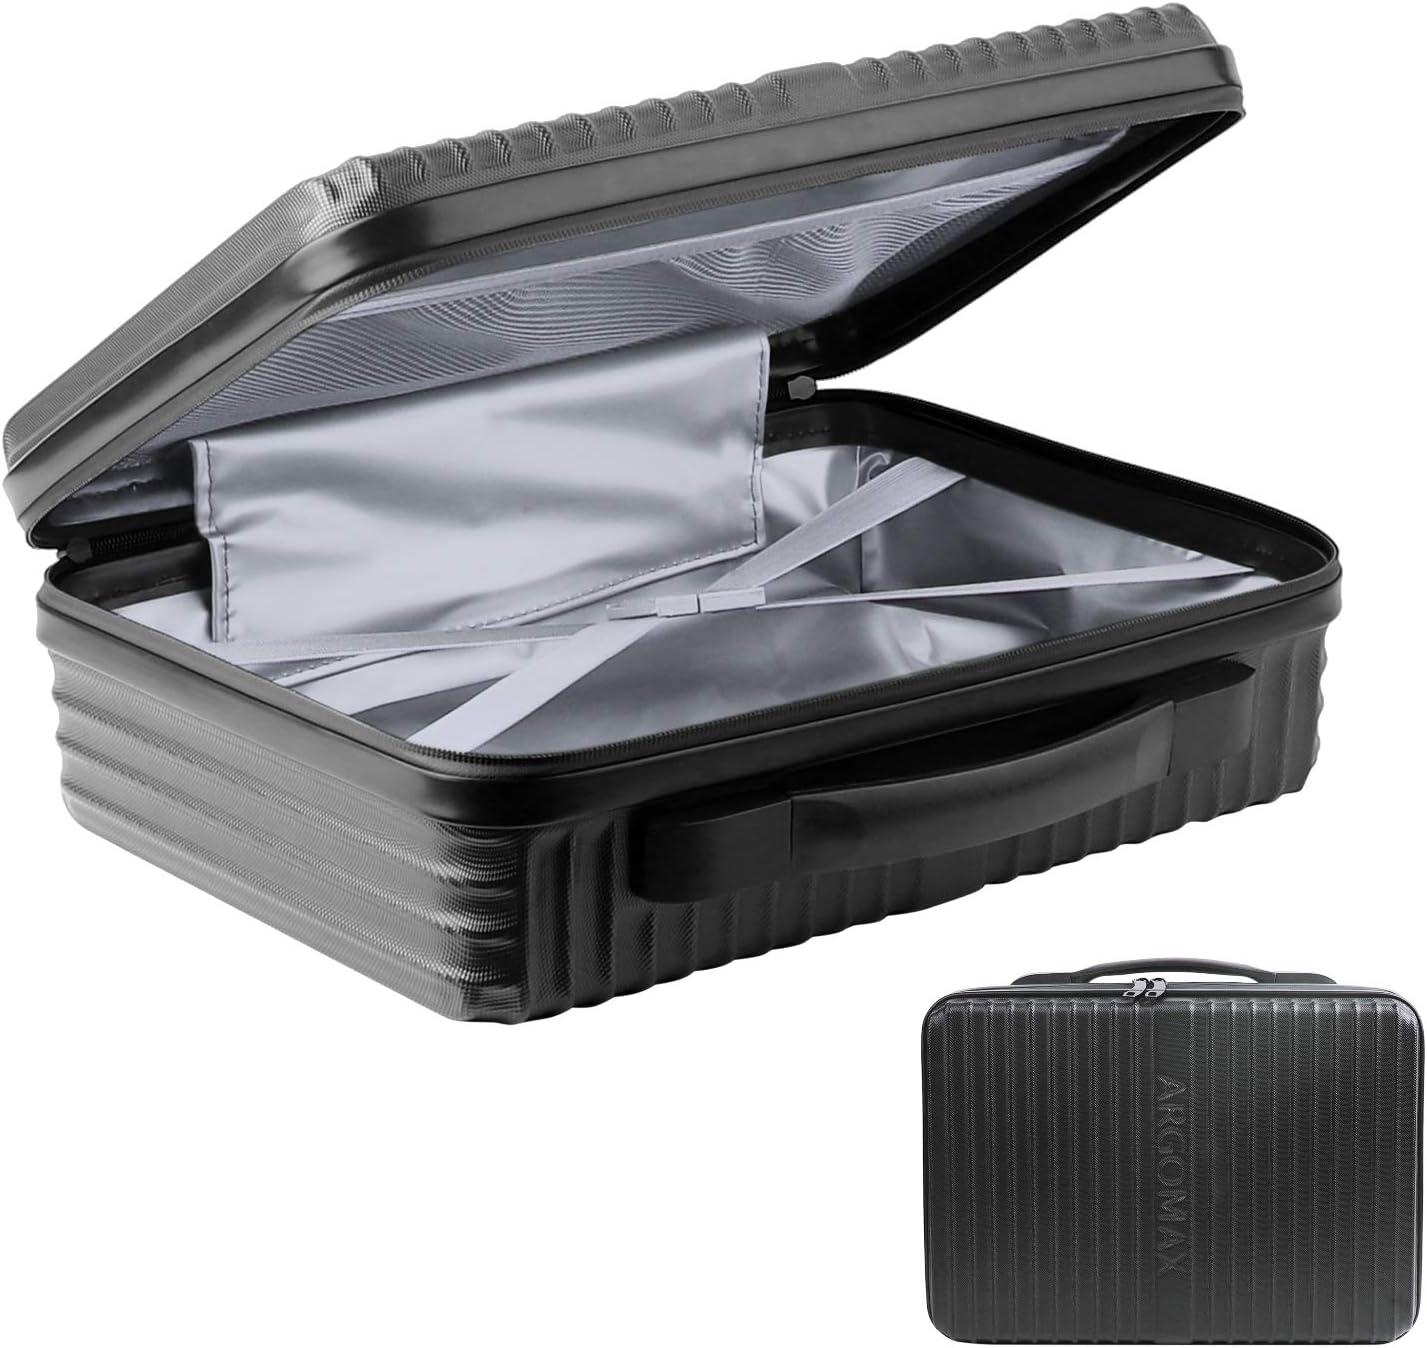 JIESI Portable Cooler Bag, Cooler Box for Beer, Travel Cooler, Insulated Slim Cooler,Slim Iceless Cooler - Black